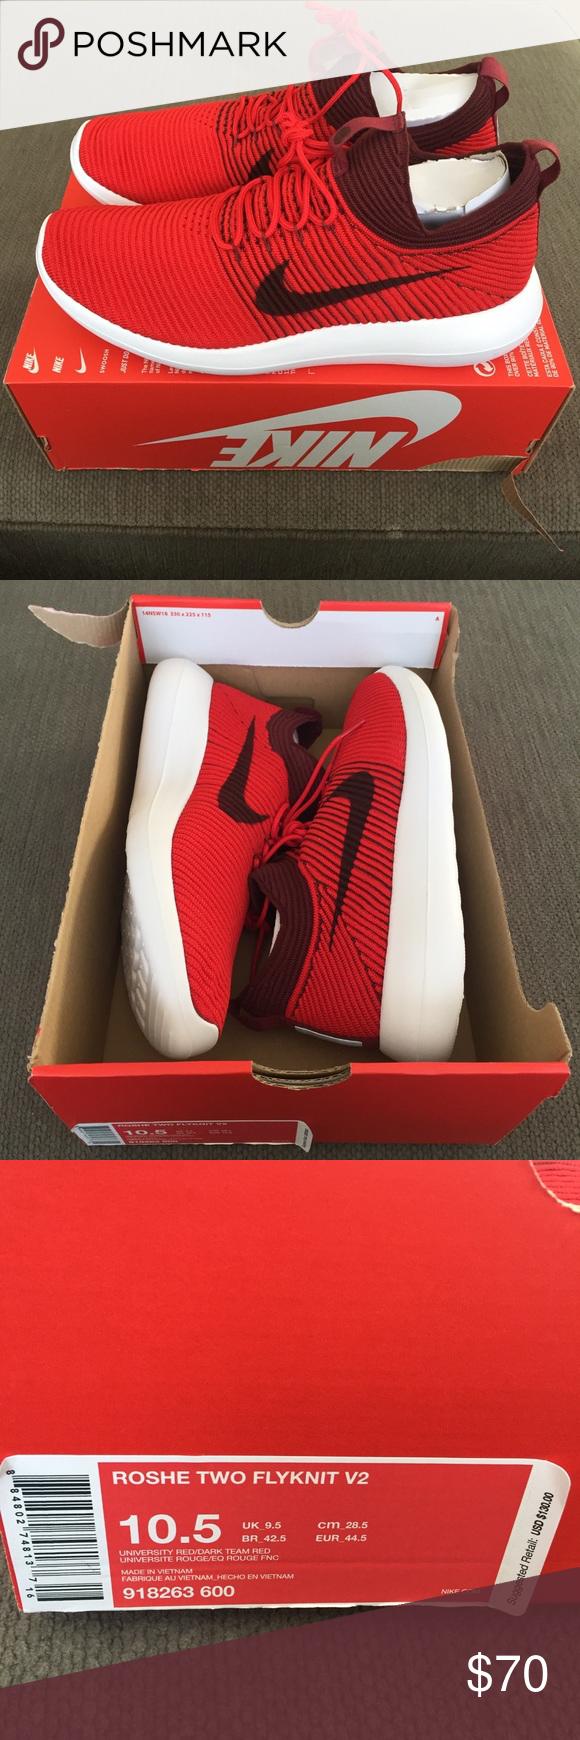 e0ec7262b5a91 Nike Roshe Two Flyknit V2 Red Shoes Men s 10.5 NWB Nike Roshe Two Flyknit  V2 University